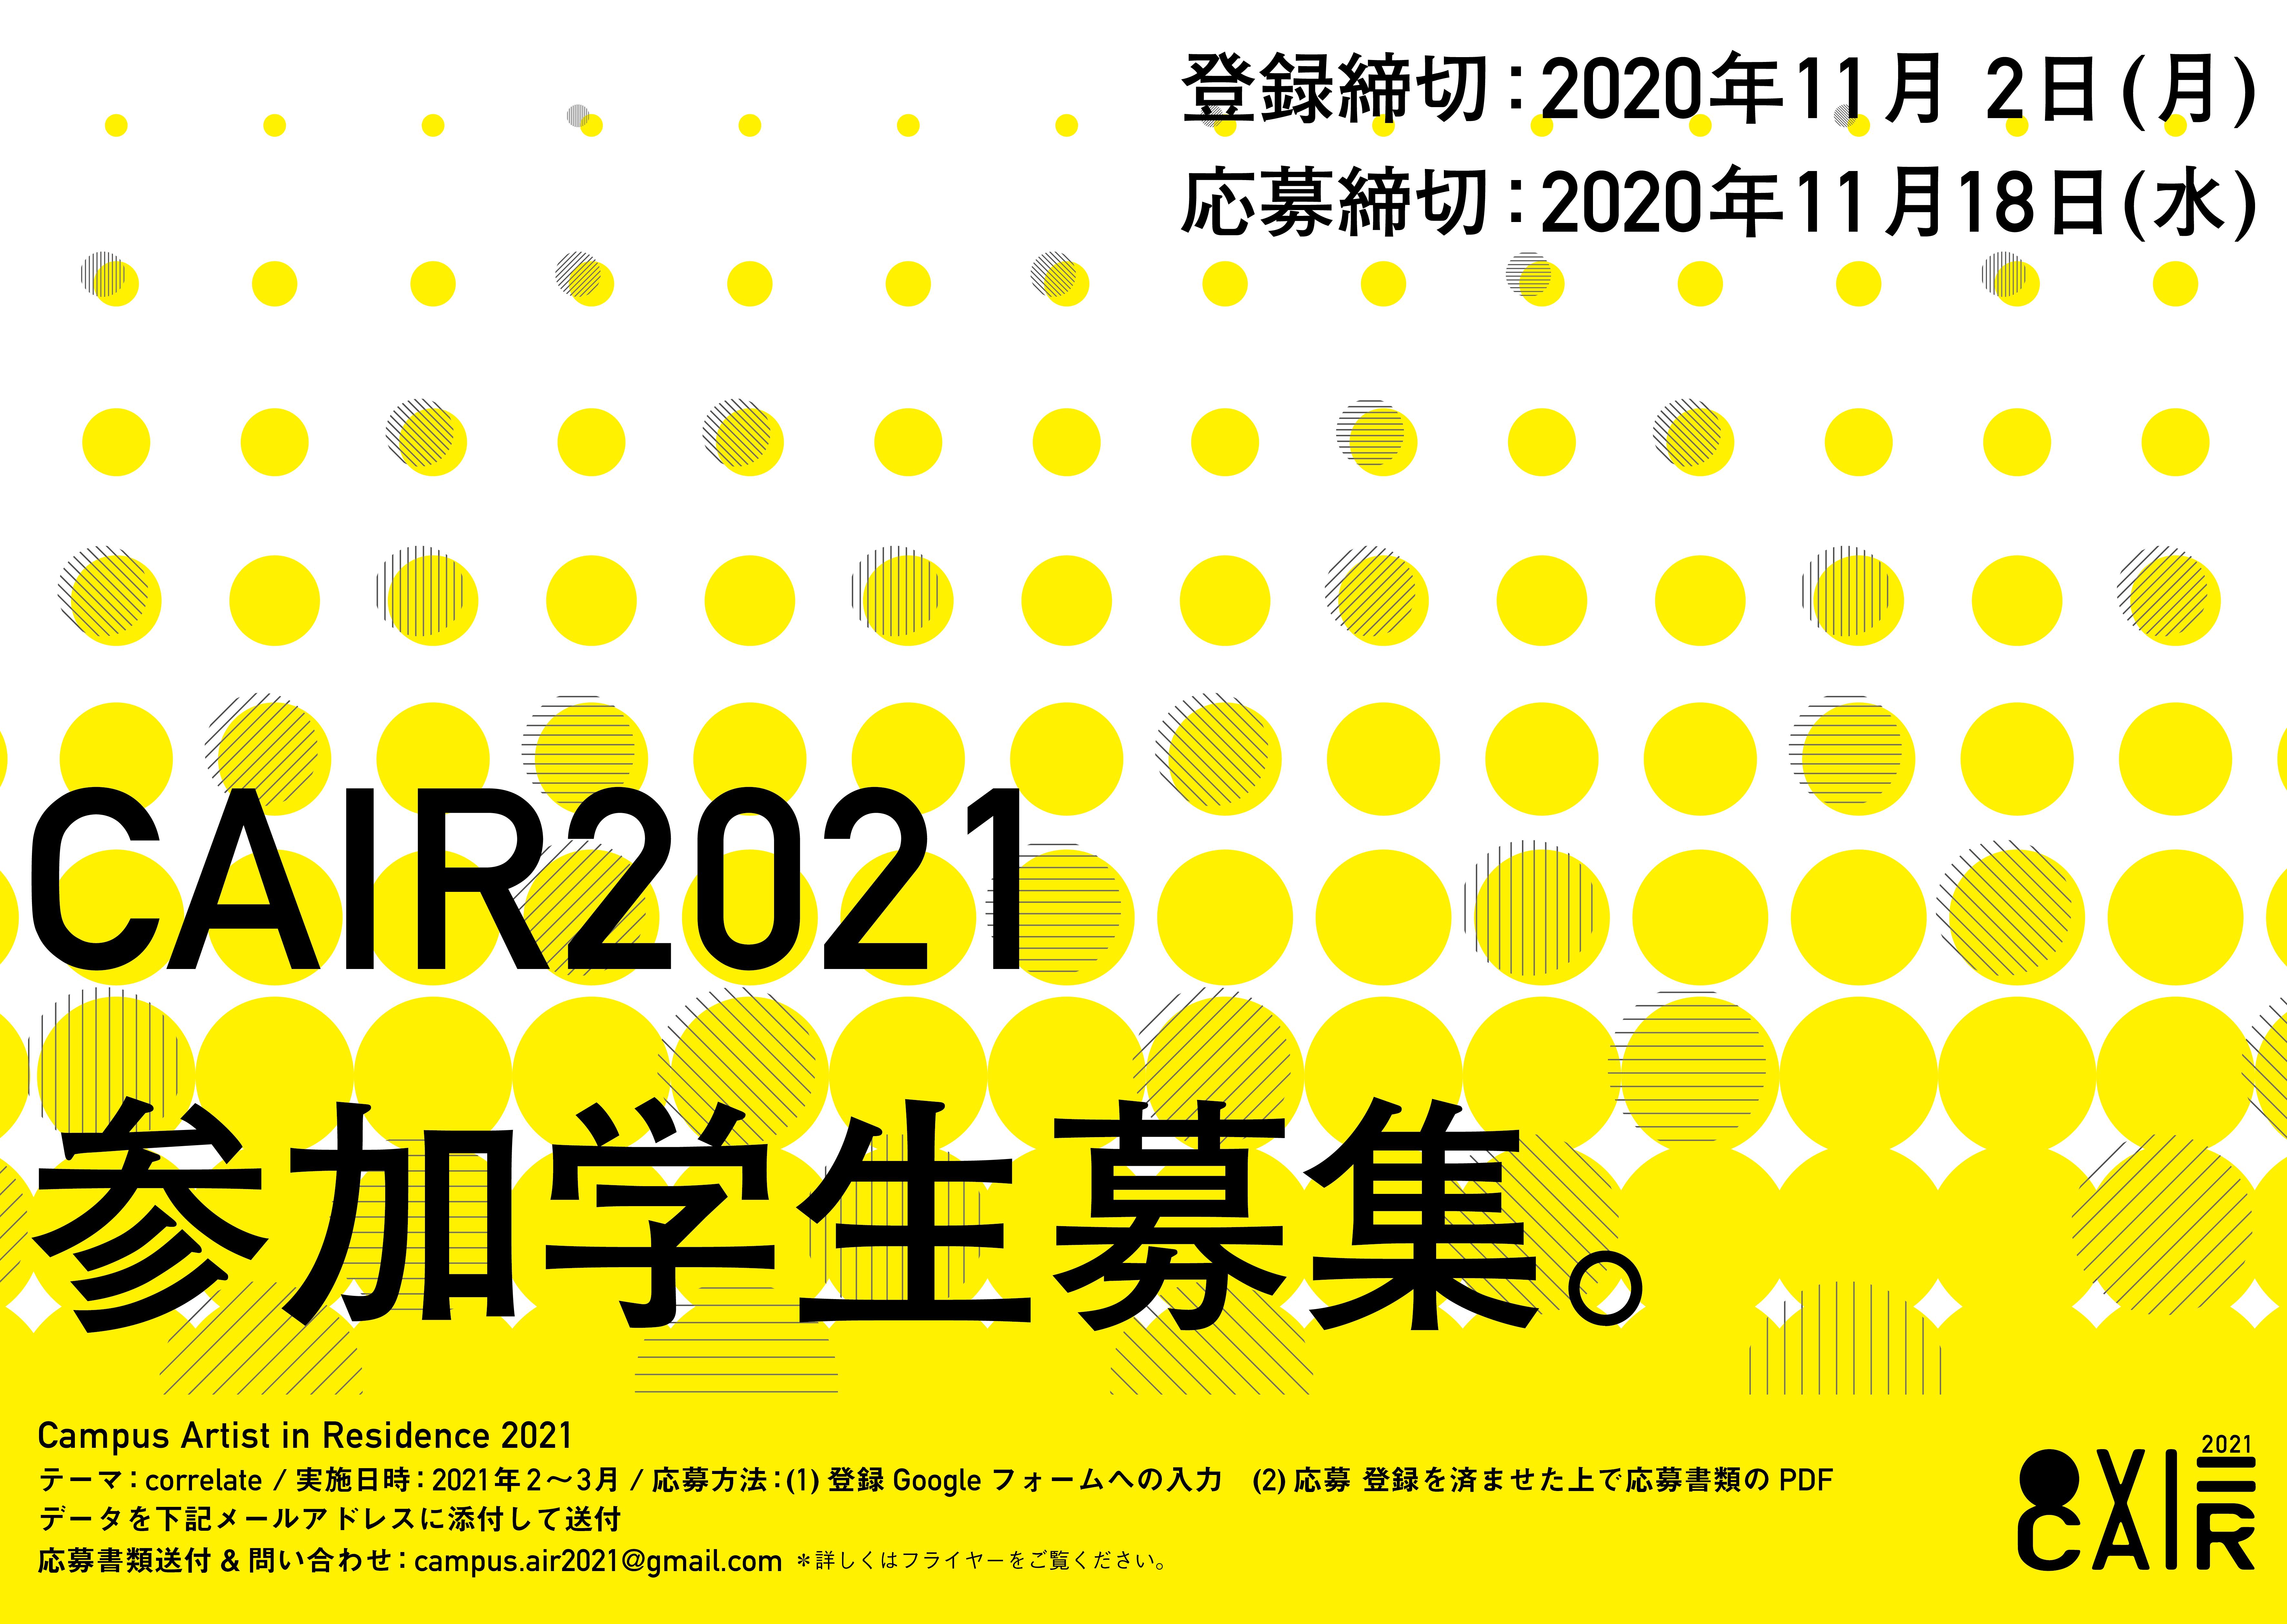 CAIR2021参加アーティストを募集いたします。